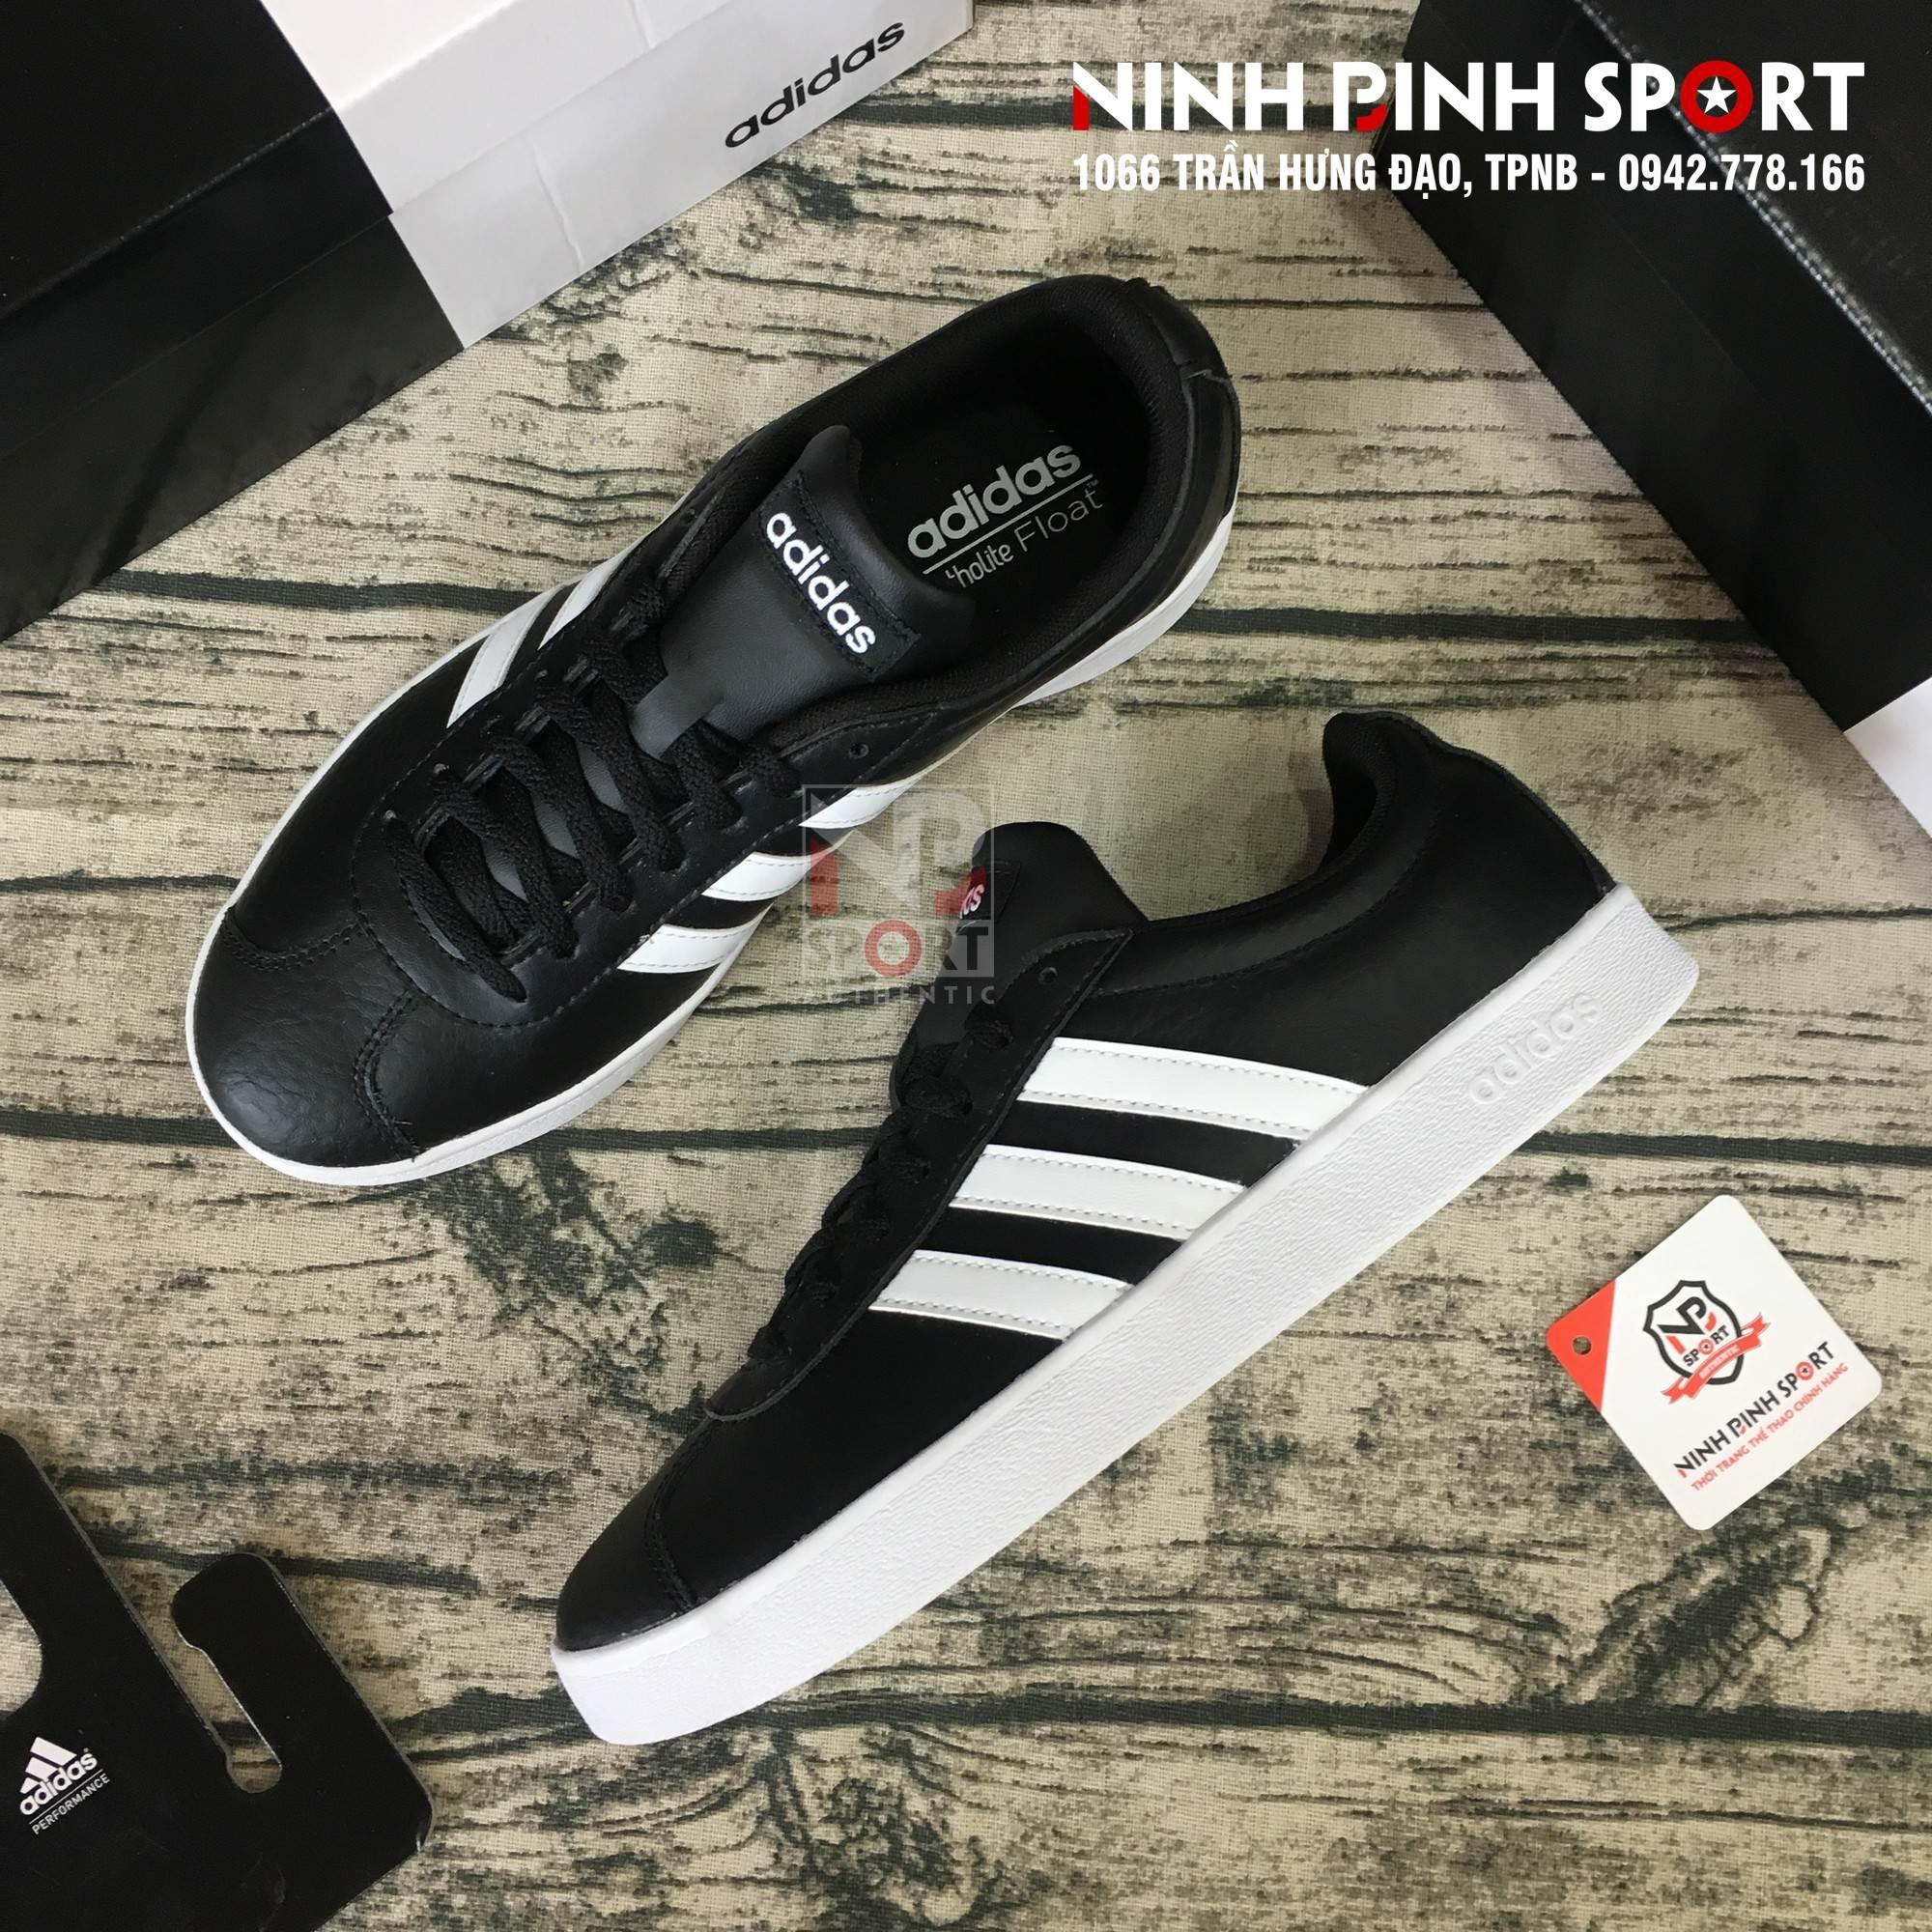 Giày thể thao nam Adidas Neo VL COURT 2.0 B43814